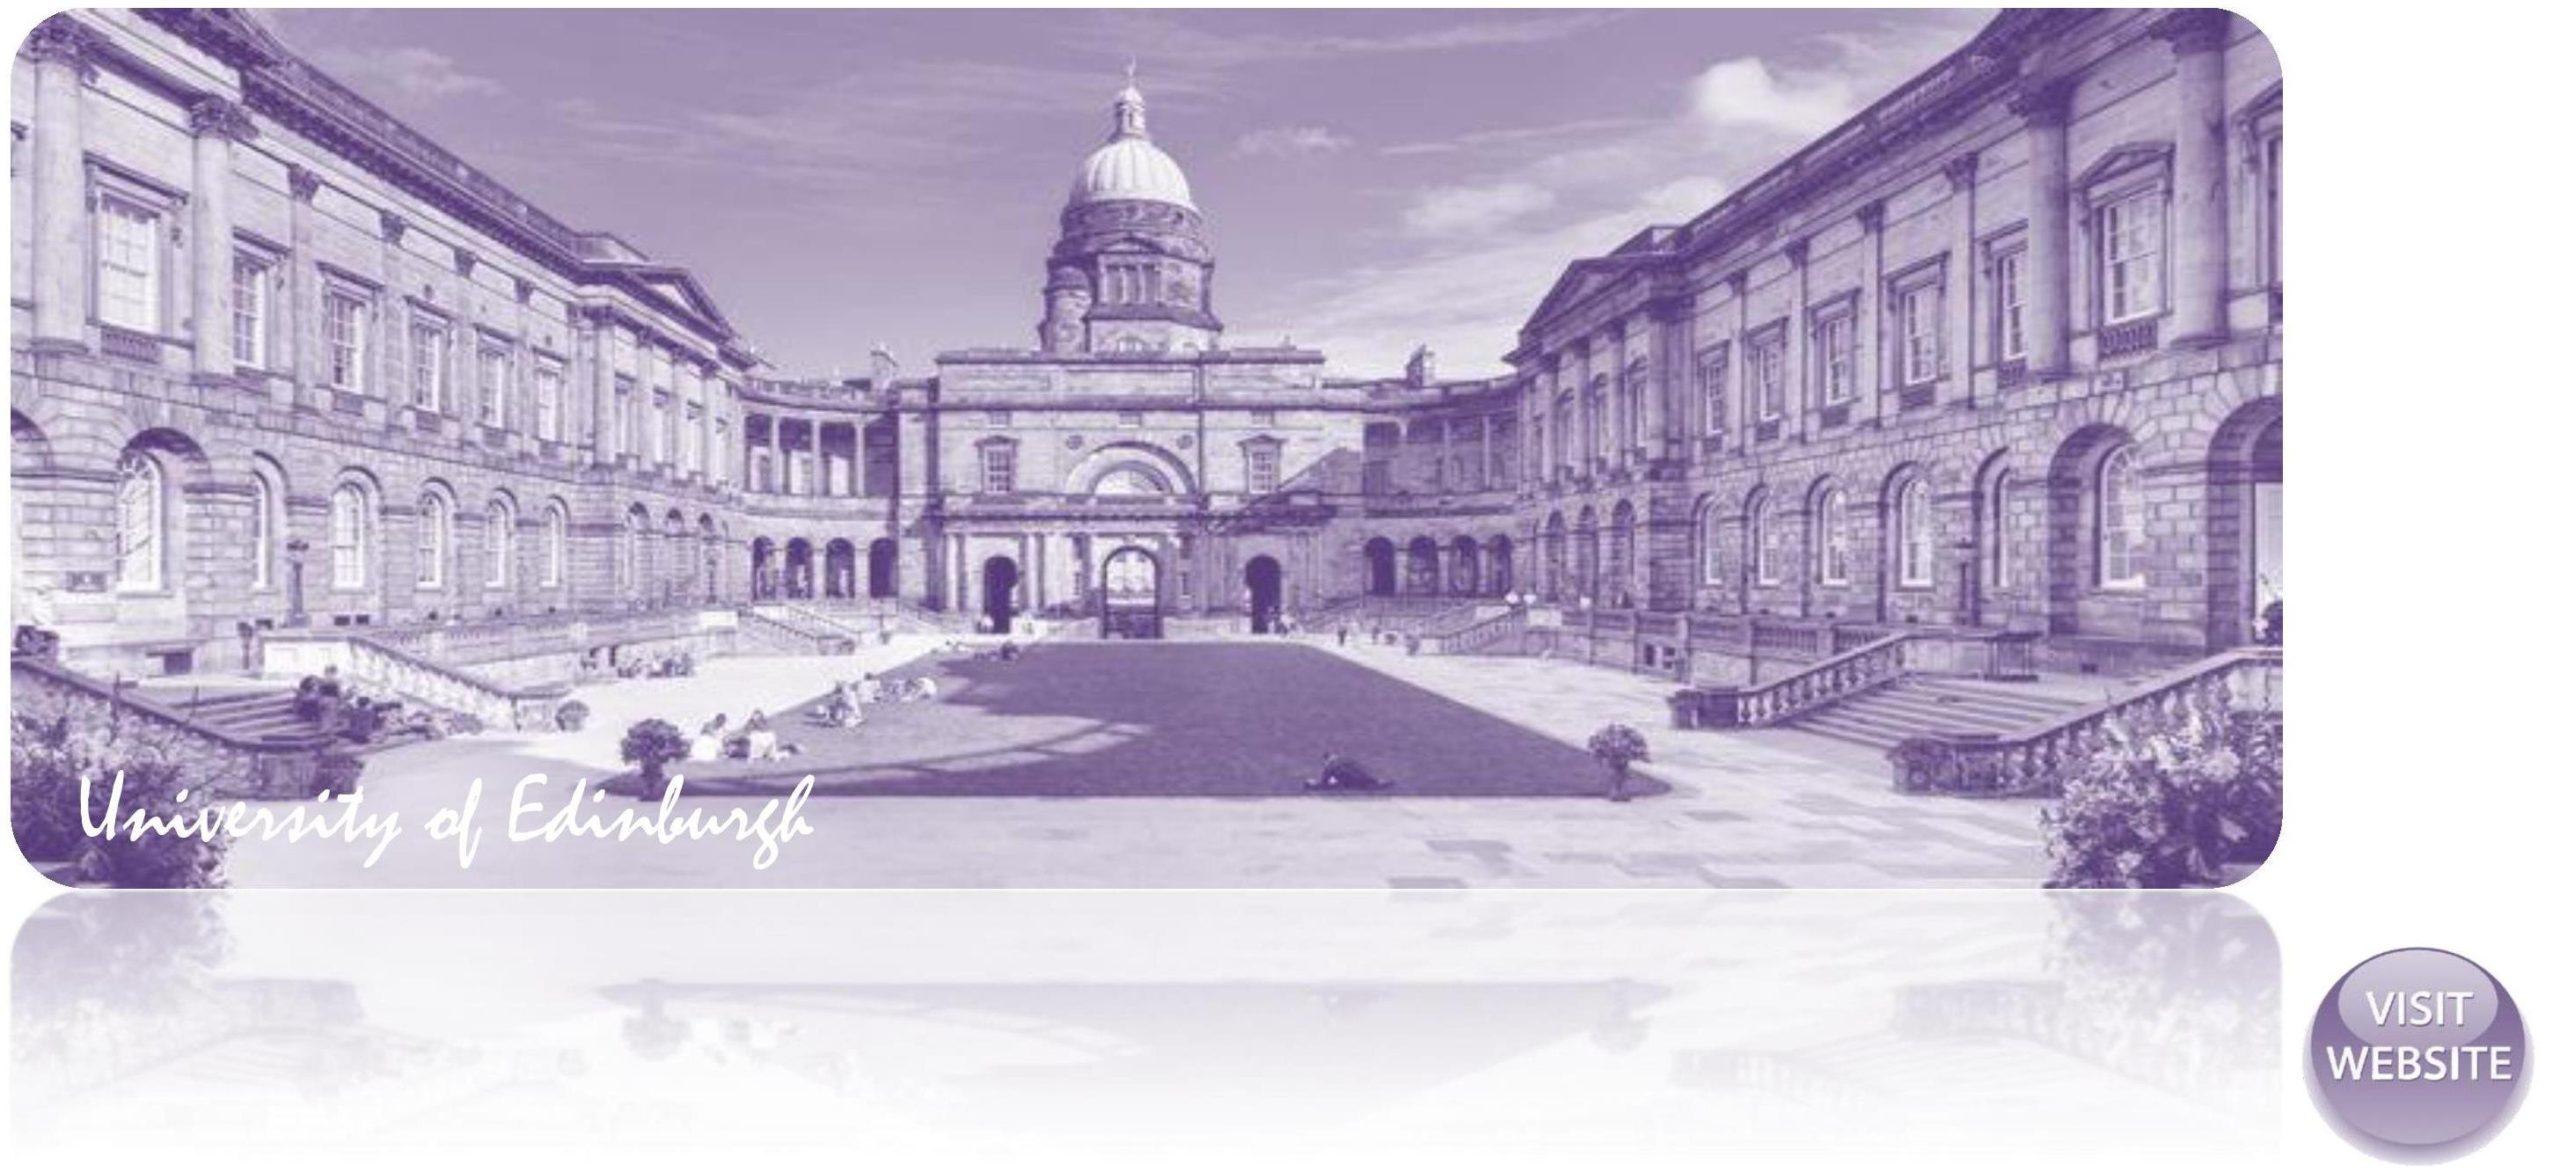 University of Edinburgh UK